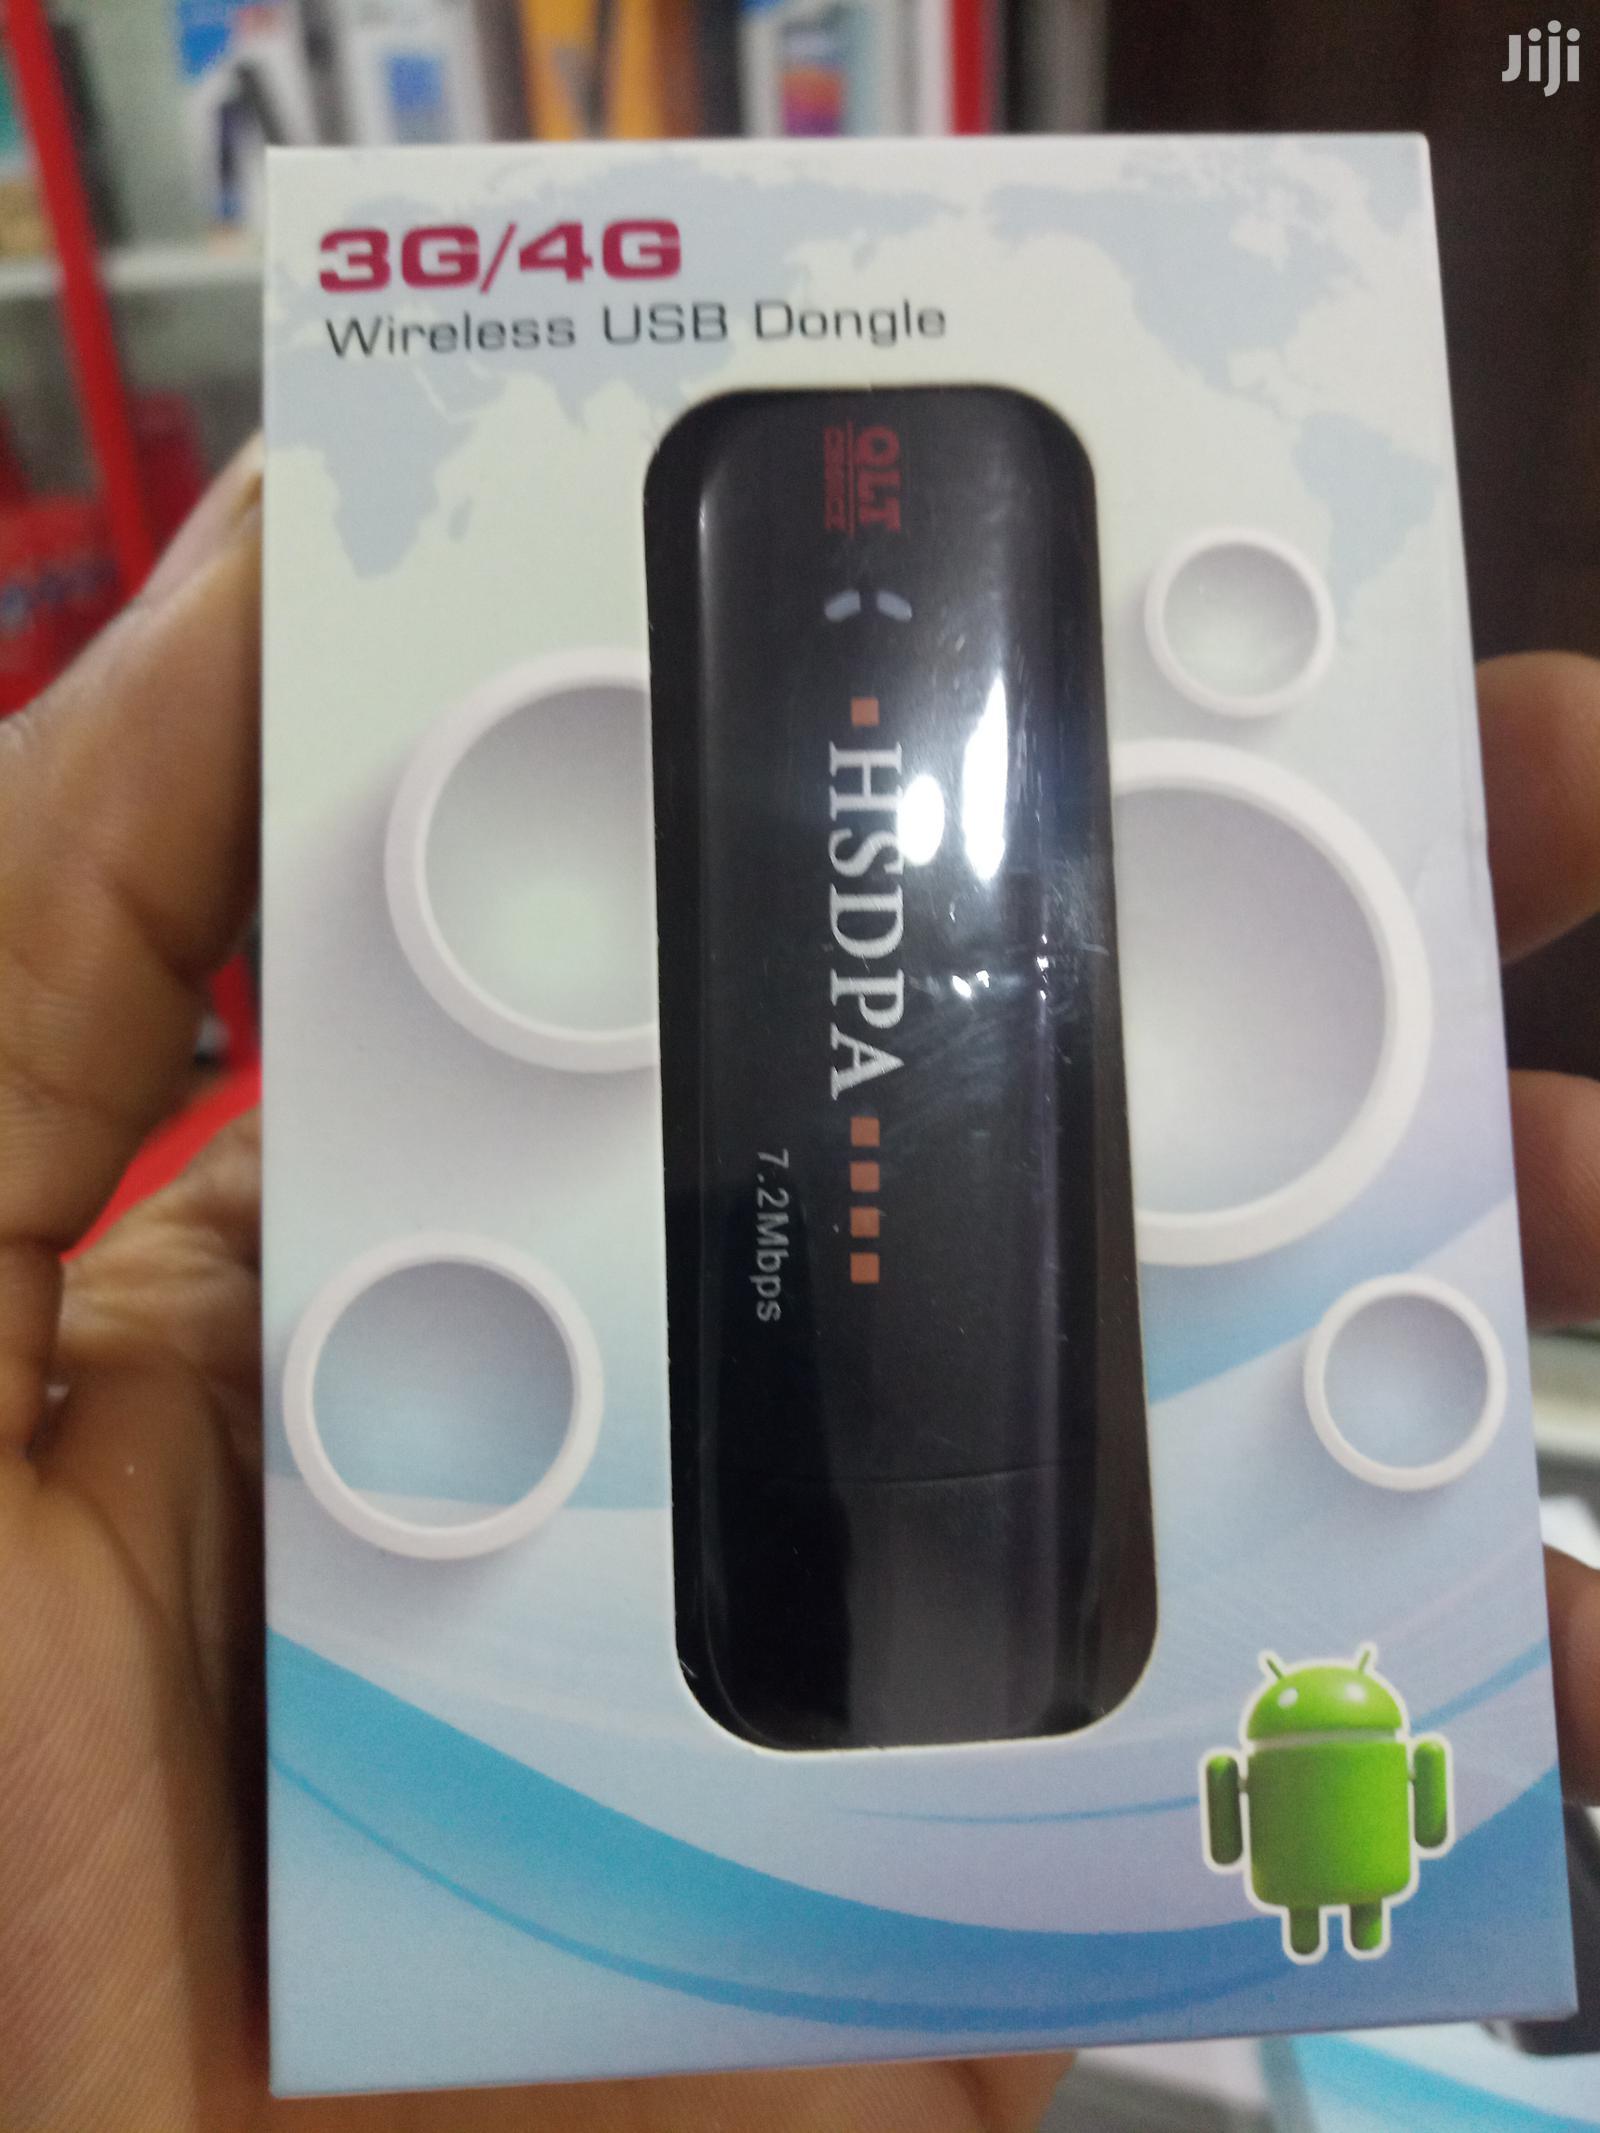 3g/4g Wireless USB Dongle(Modem)